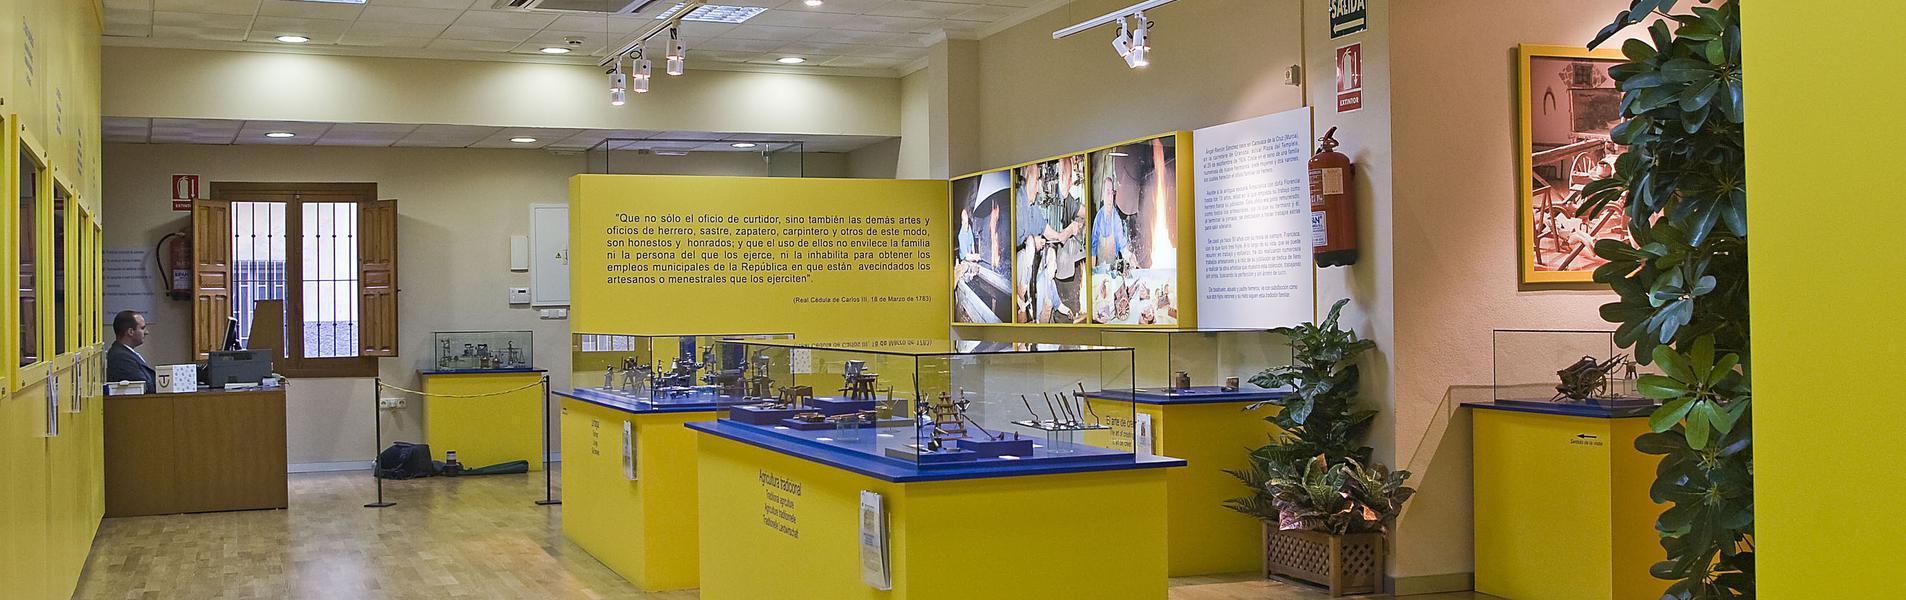 Museo Etnográfico en miniatura Ángel Reinón